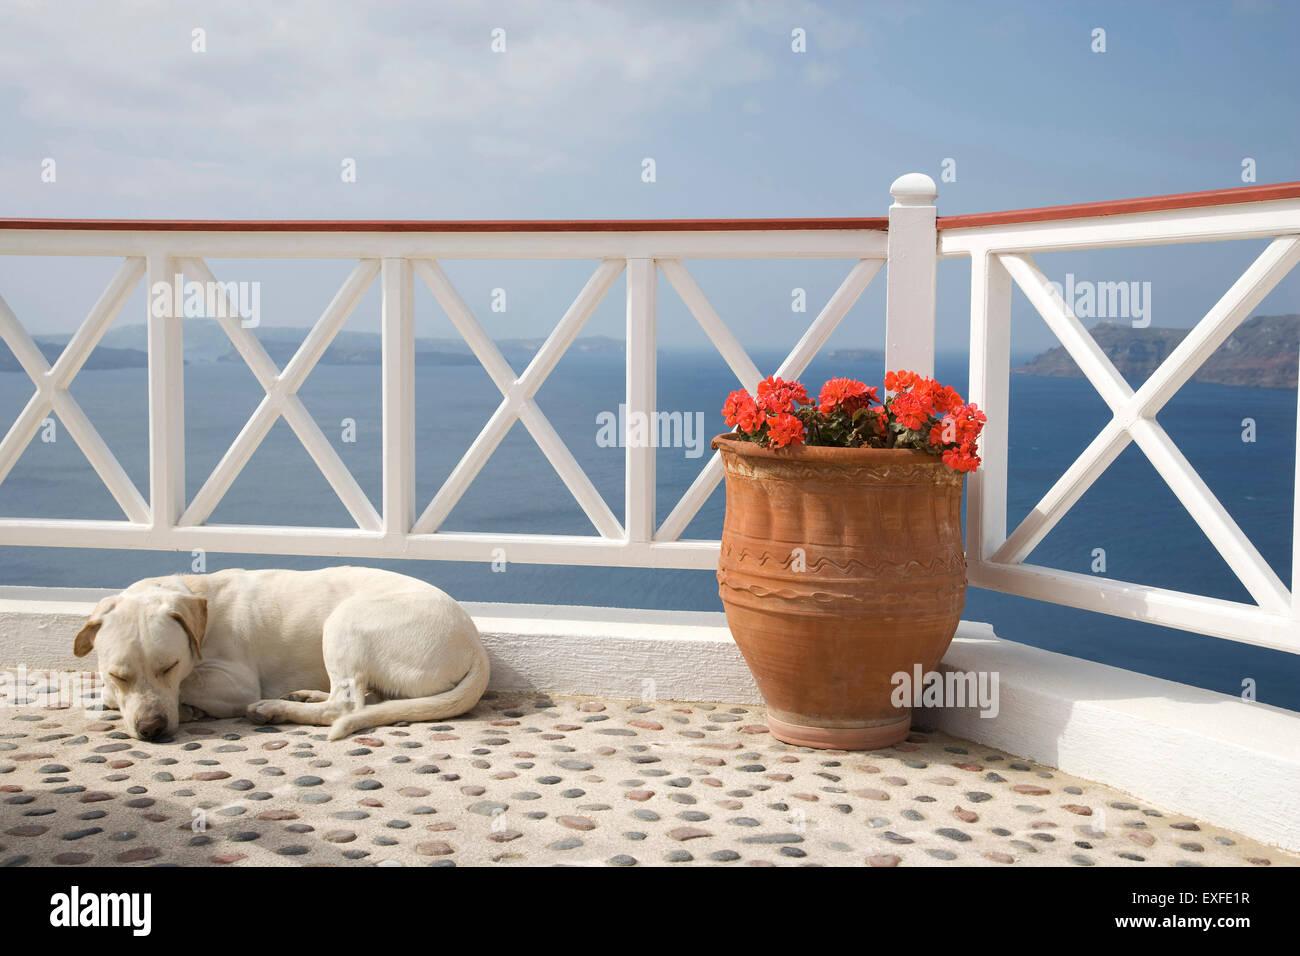 Dog sleeping on balcony with sea view, Oia, Santorini, Cyclades, Greece - Stock Image